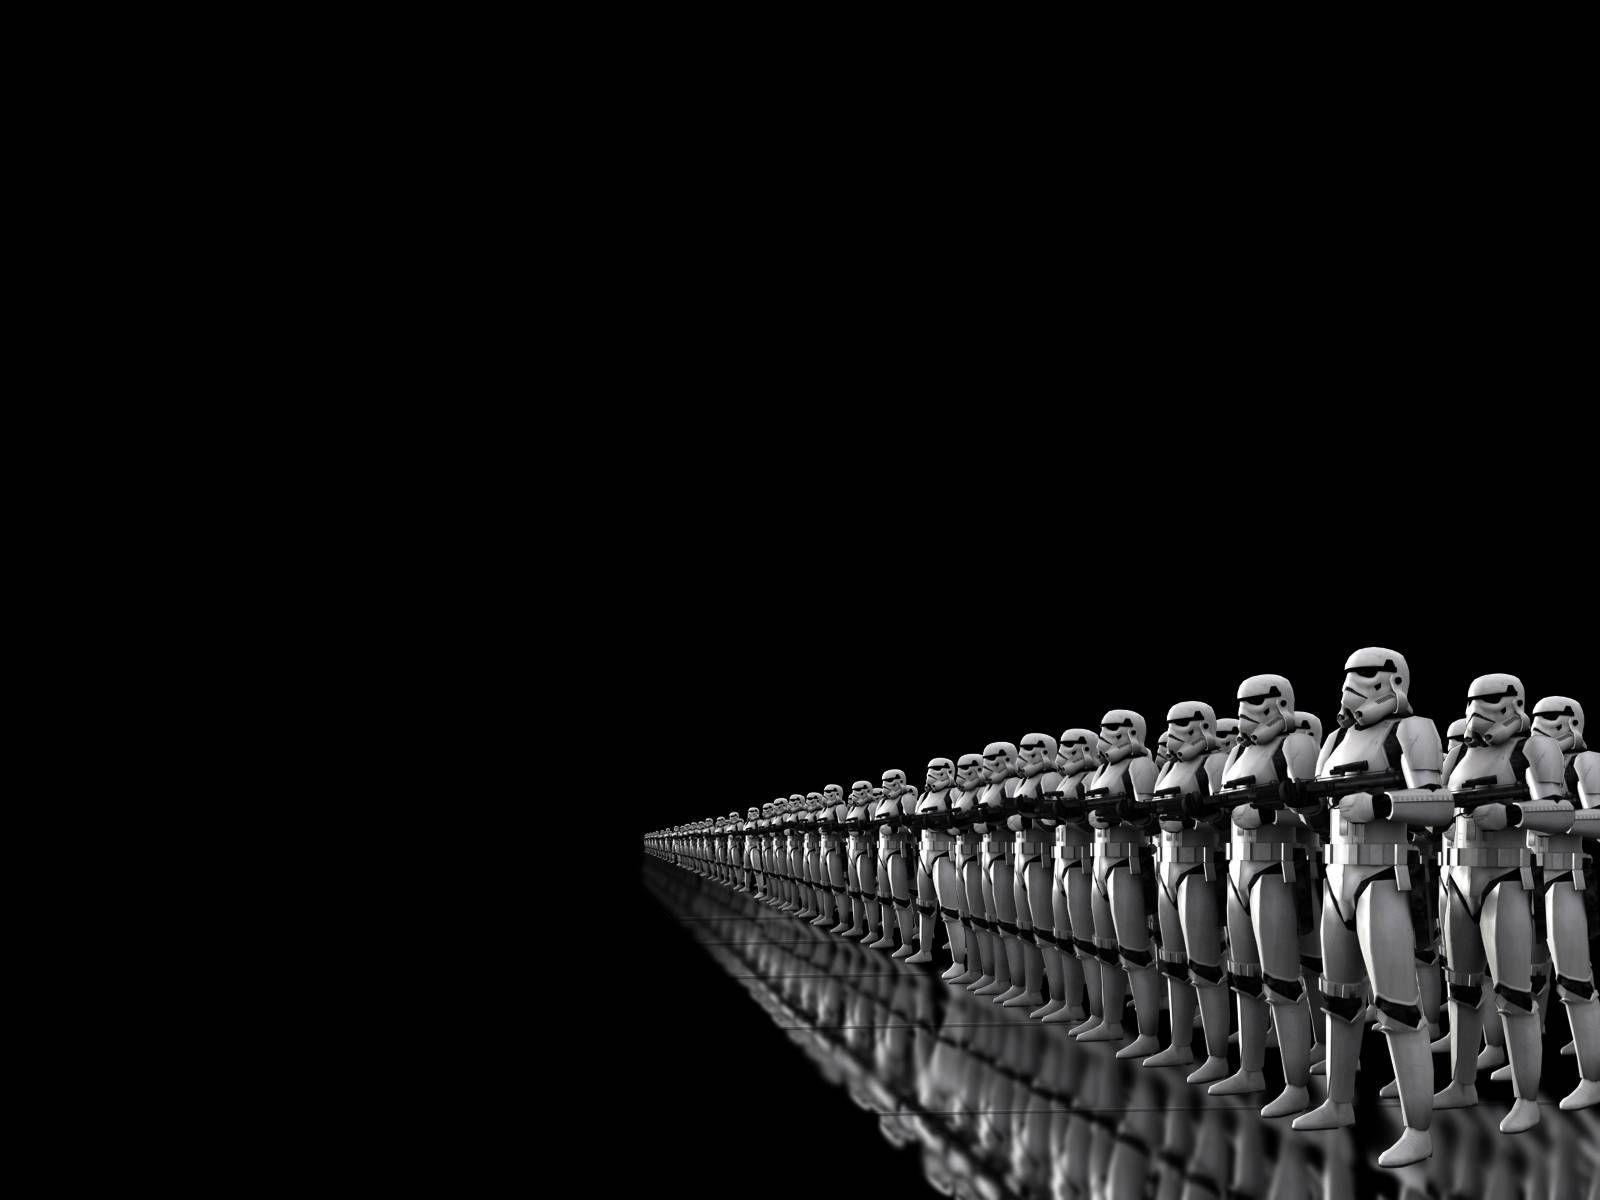 Star wars Neon Stormtrooper | Star Wars Wallpapers & Cool Pics ...